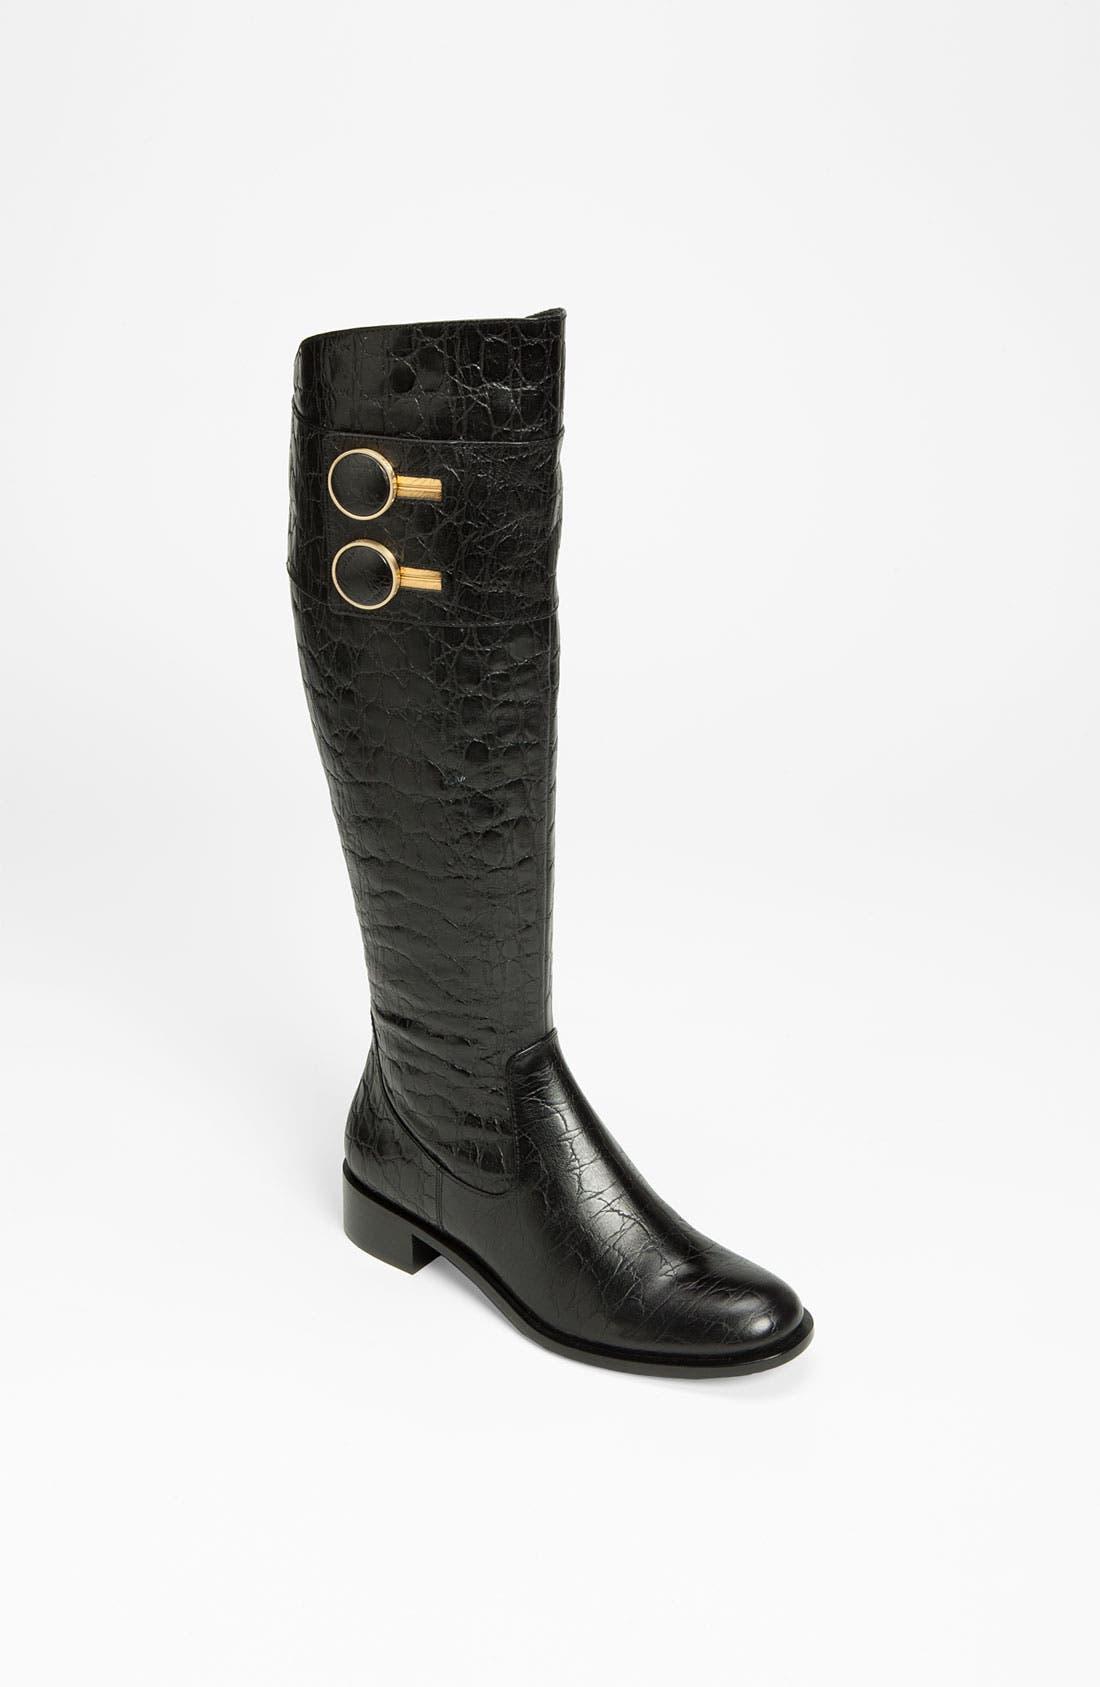 Alternate Image 1 Selected - Rachel Zoe 'Jacqueline' Boot